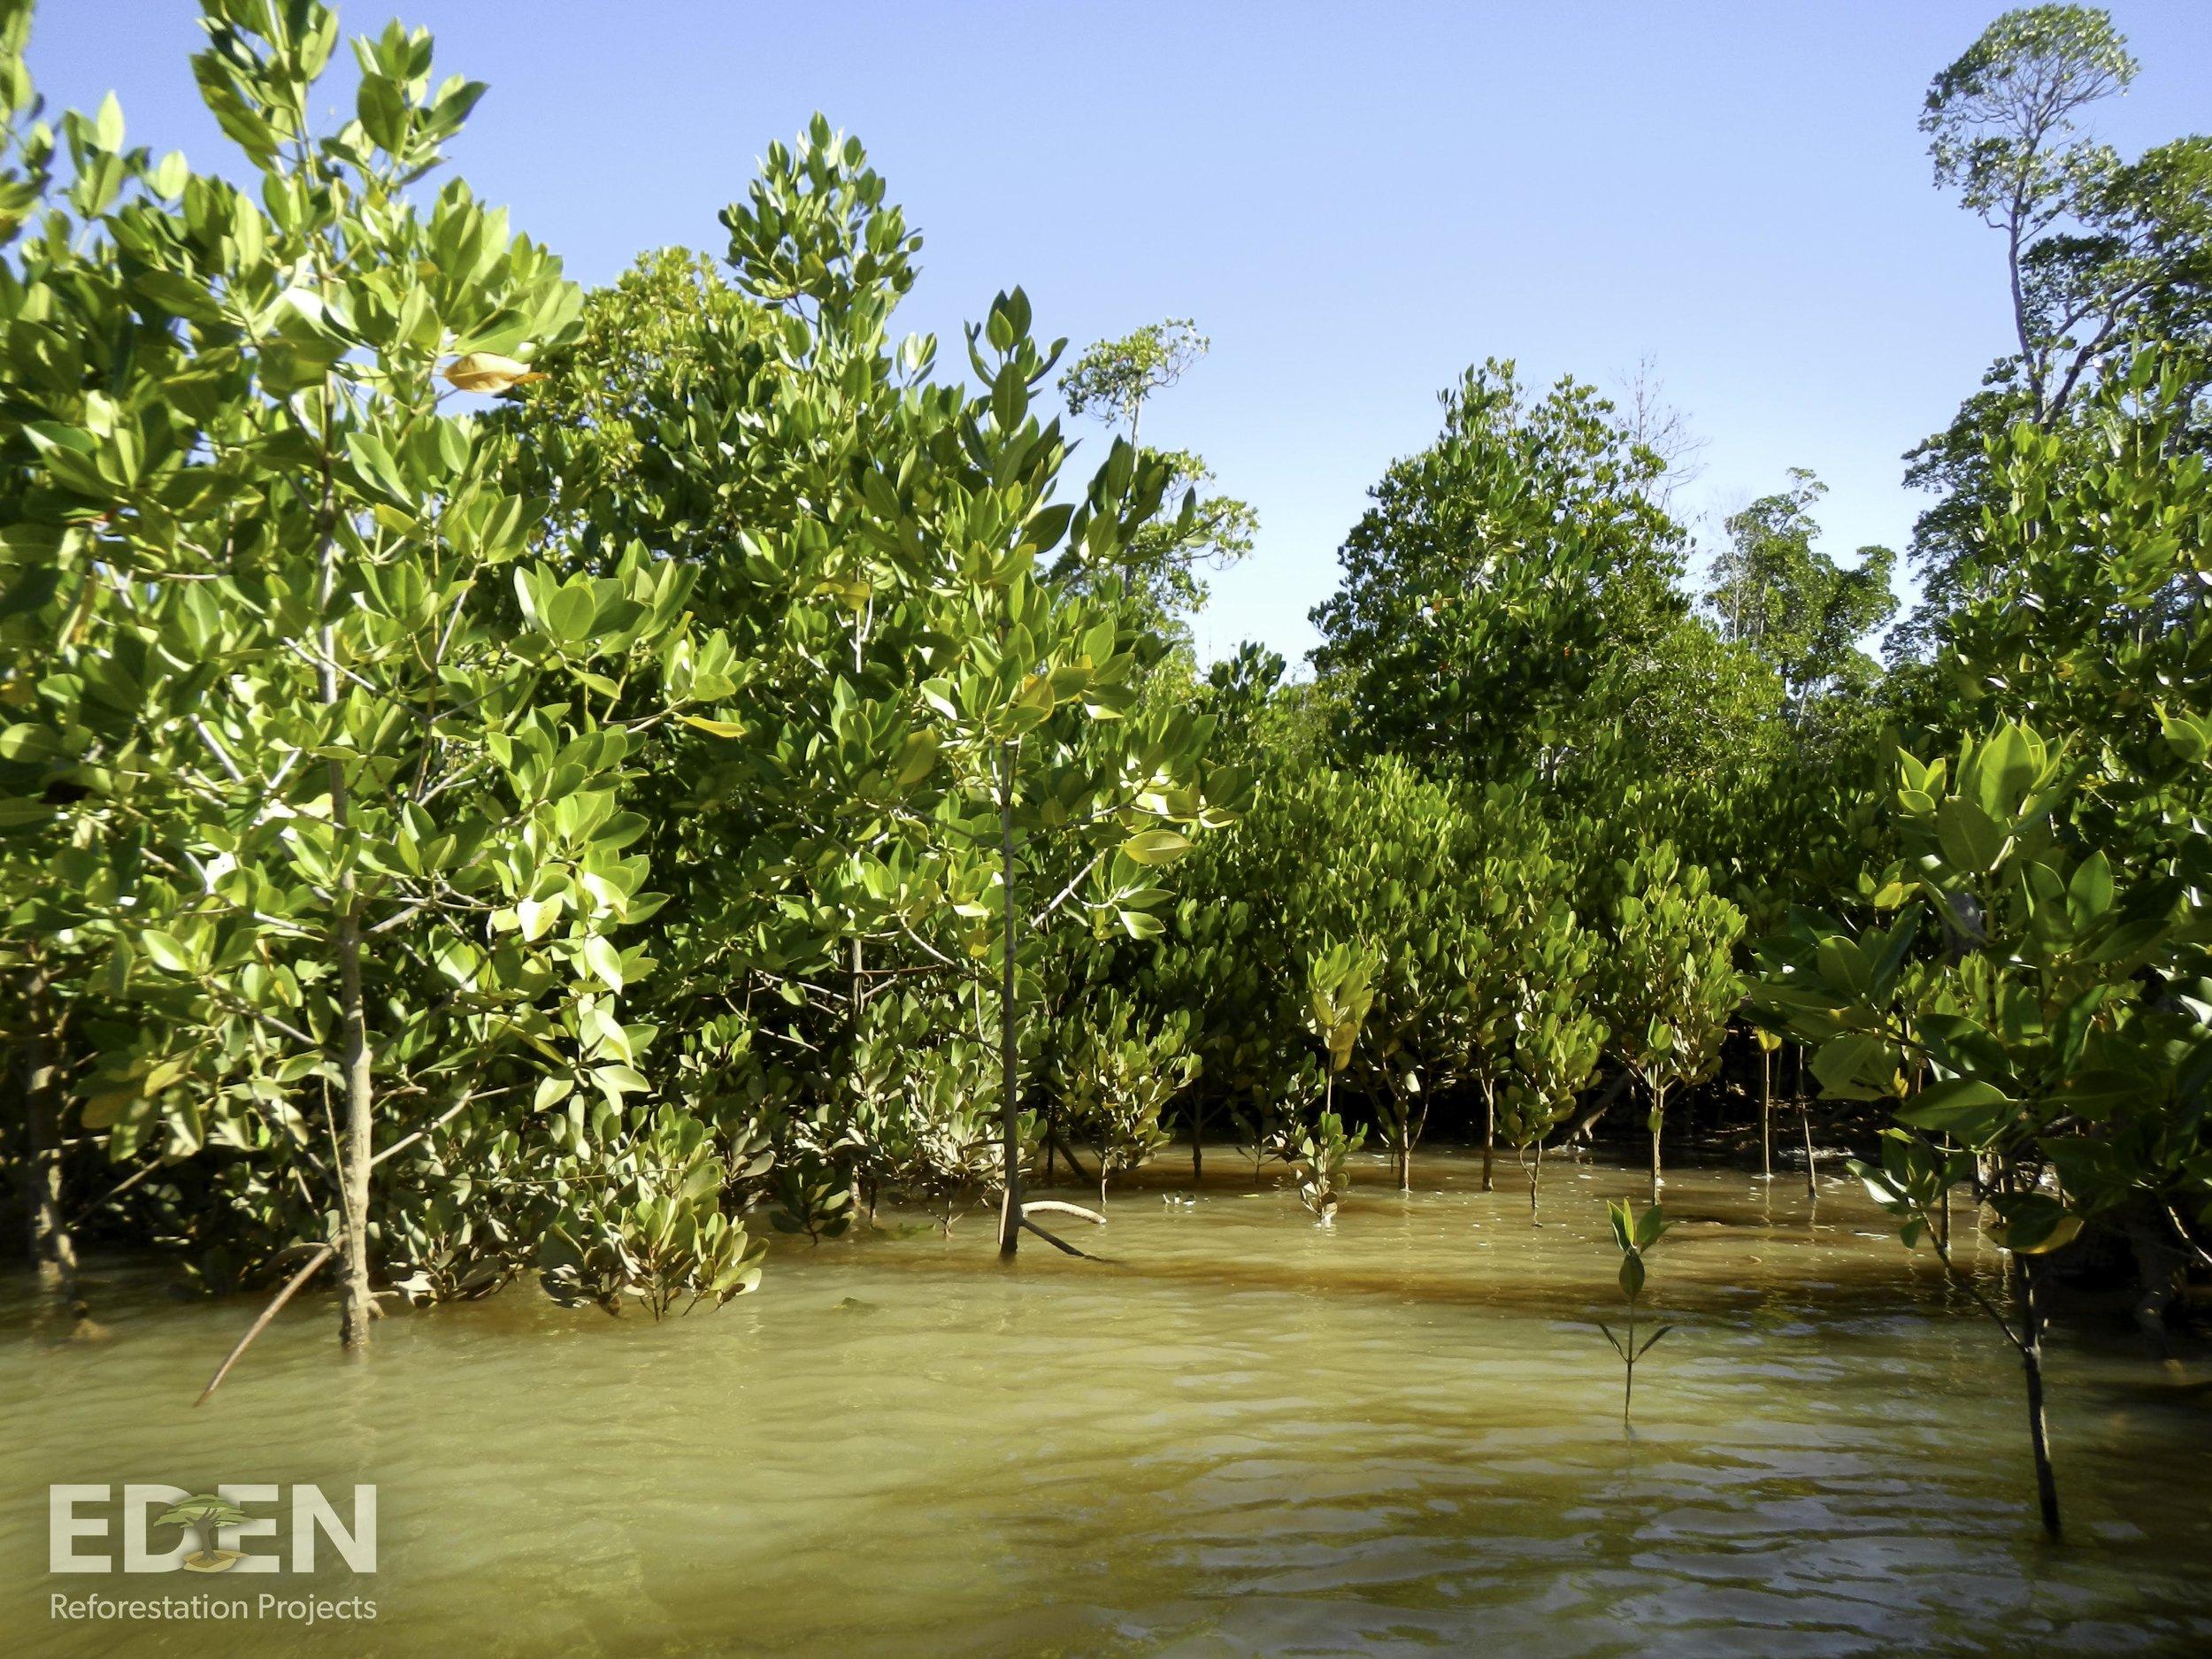 Madagascar_2013_Young mangrove forest.jpg